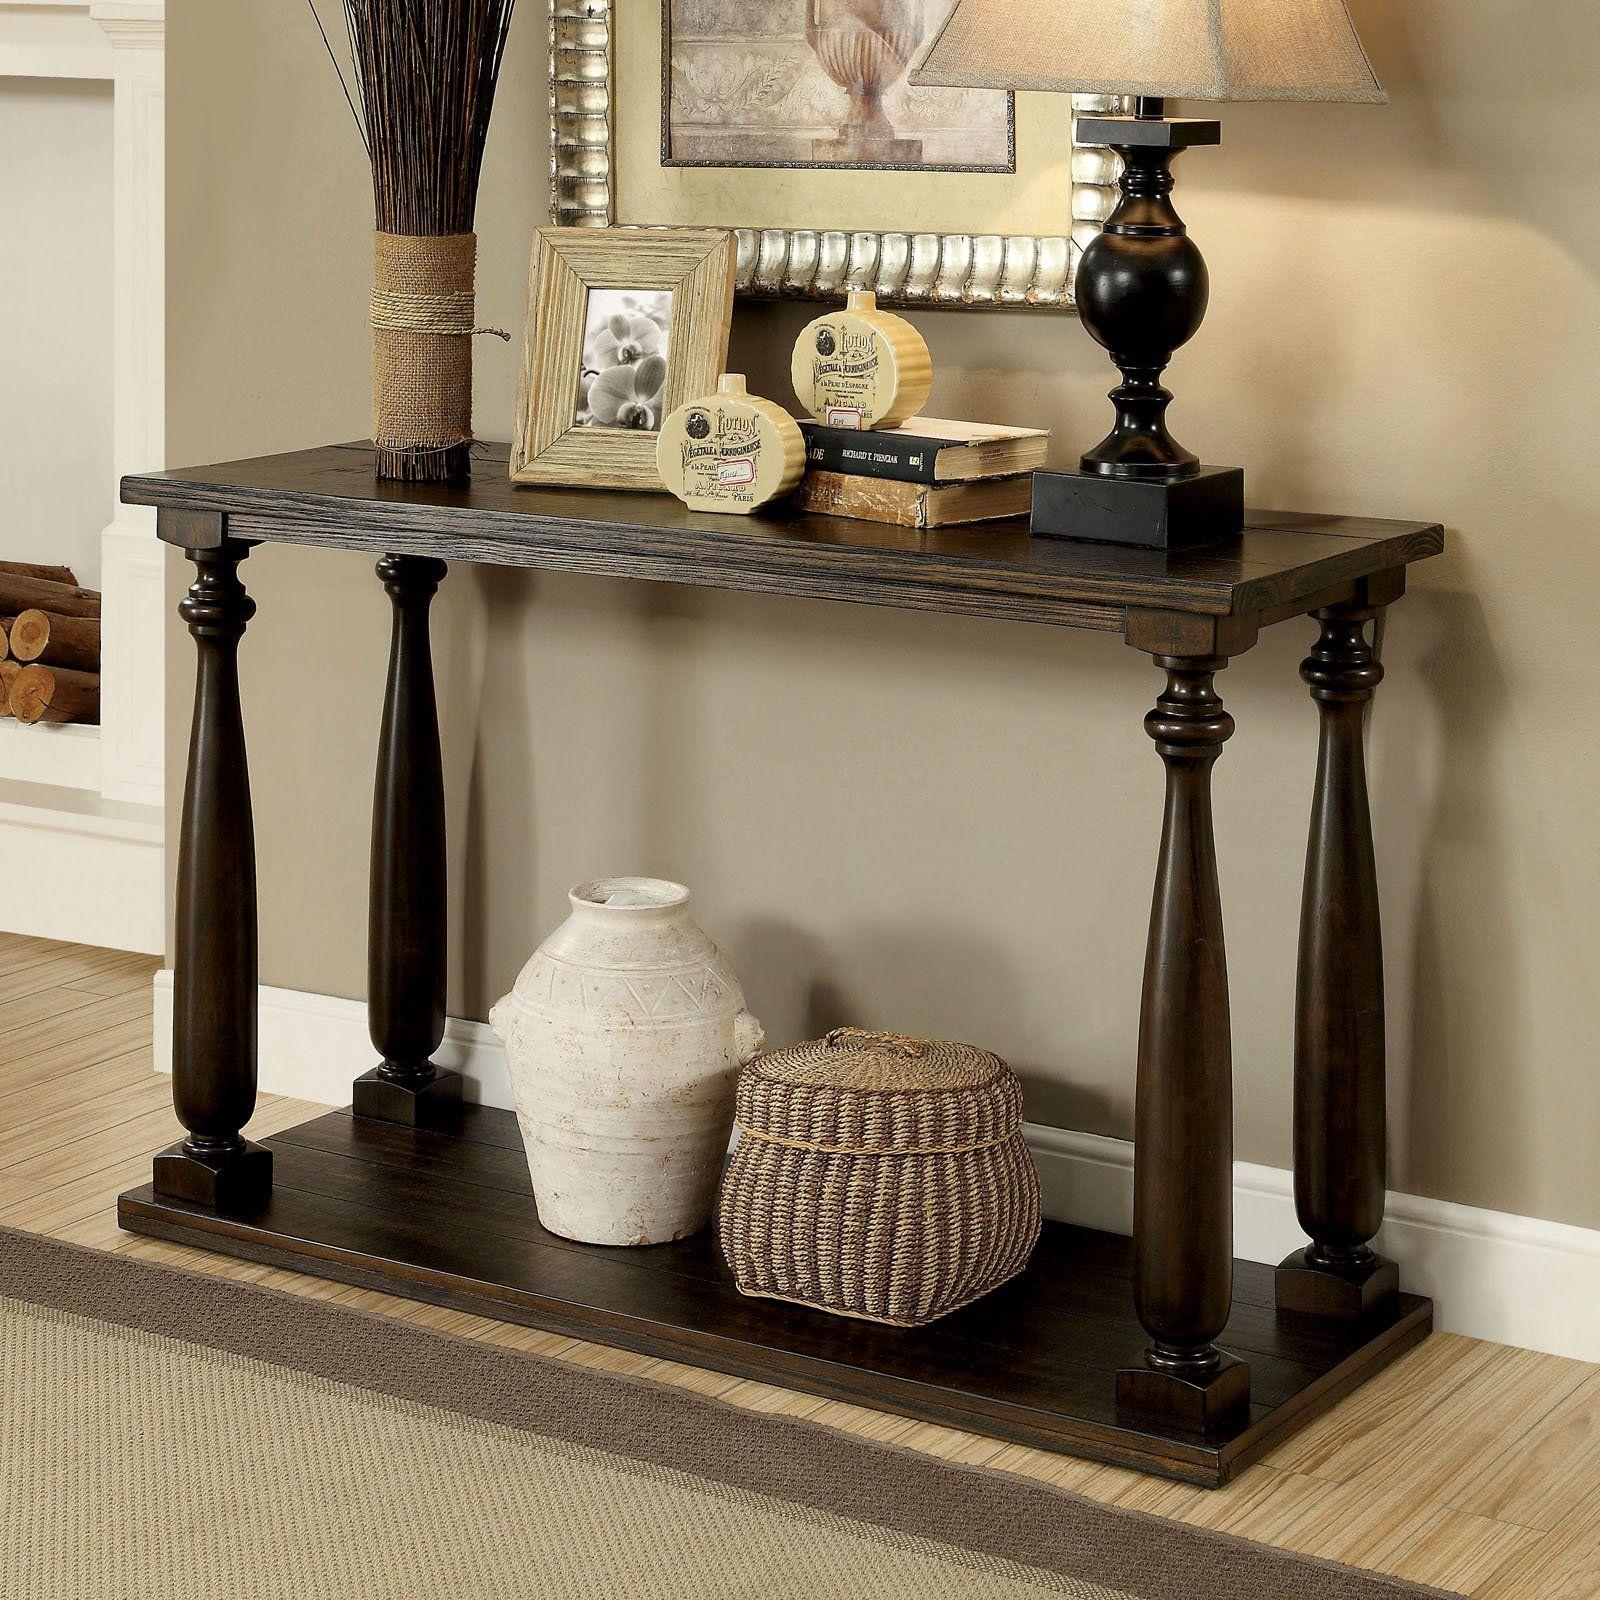 Wondrous Furniture Of America Shandy Transitional Style Turned Leg Ibusinesslaw Wood Chair Design Ideas Ibusinesslaworg